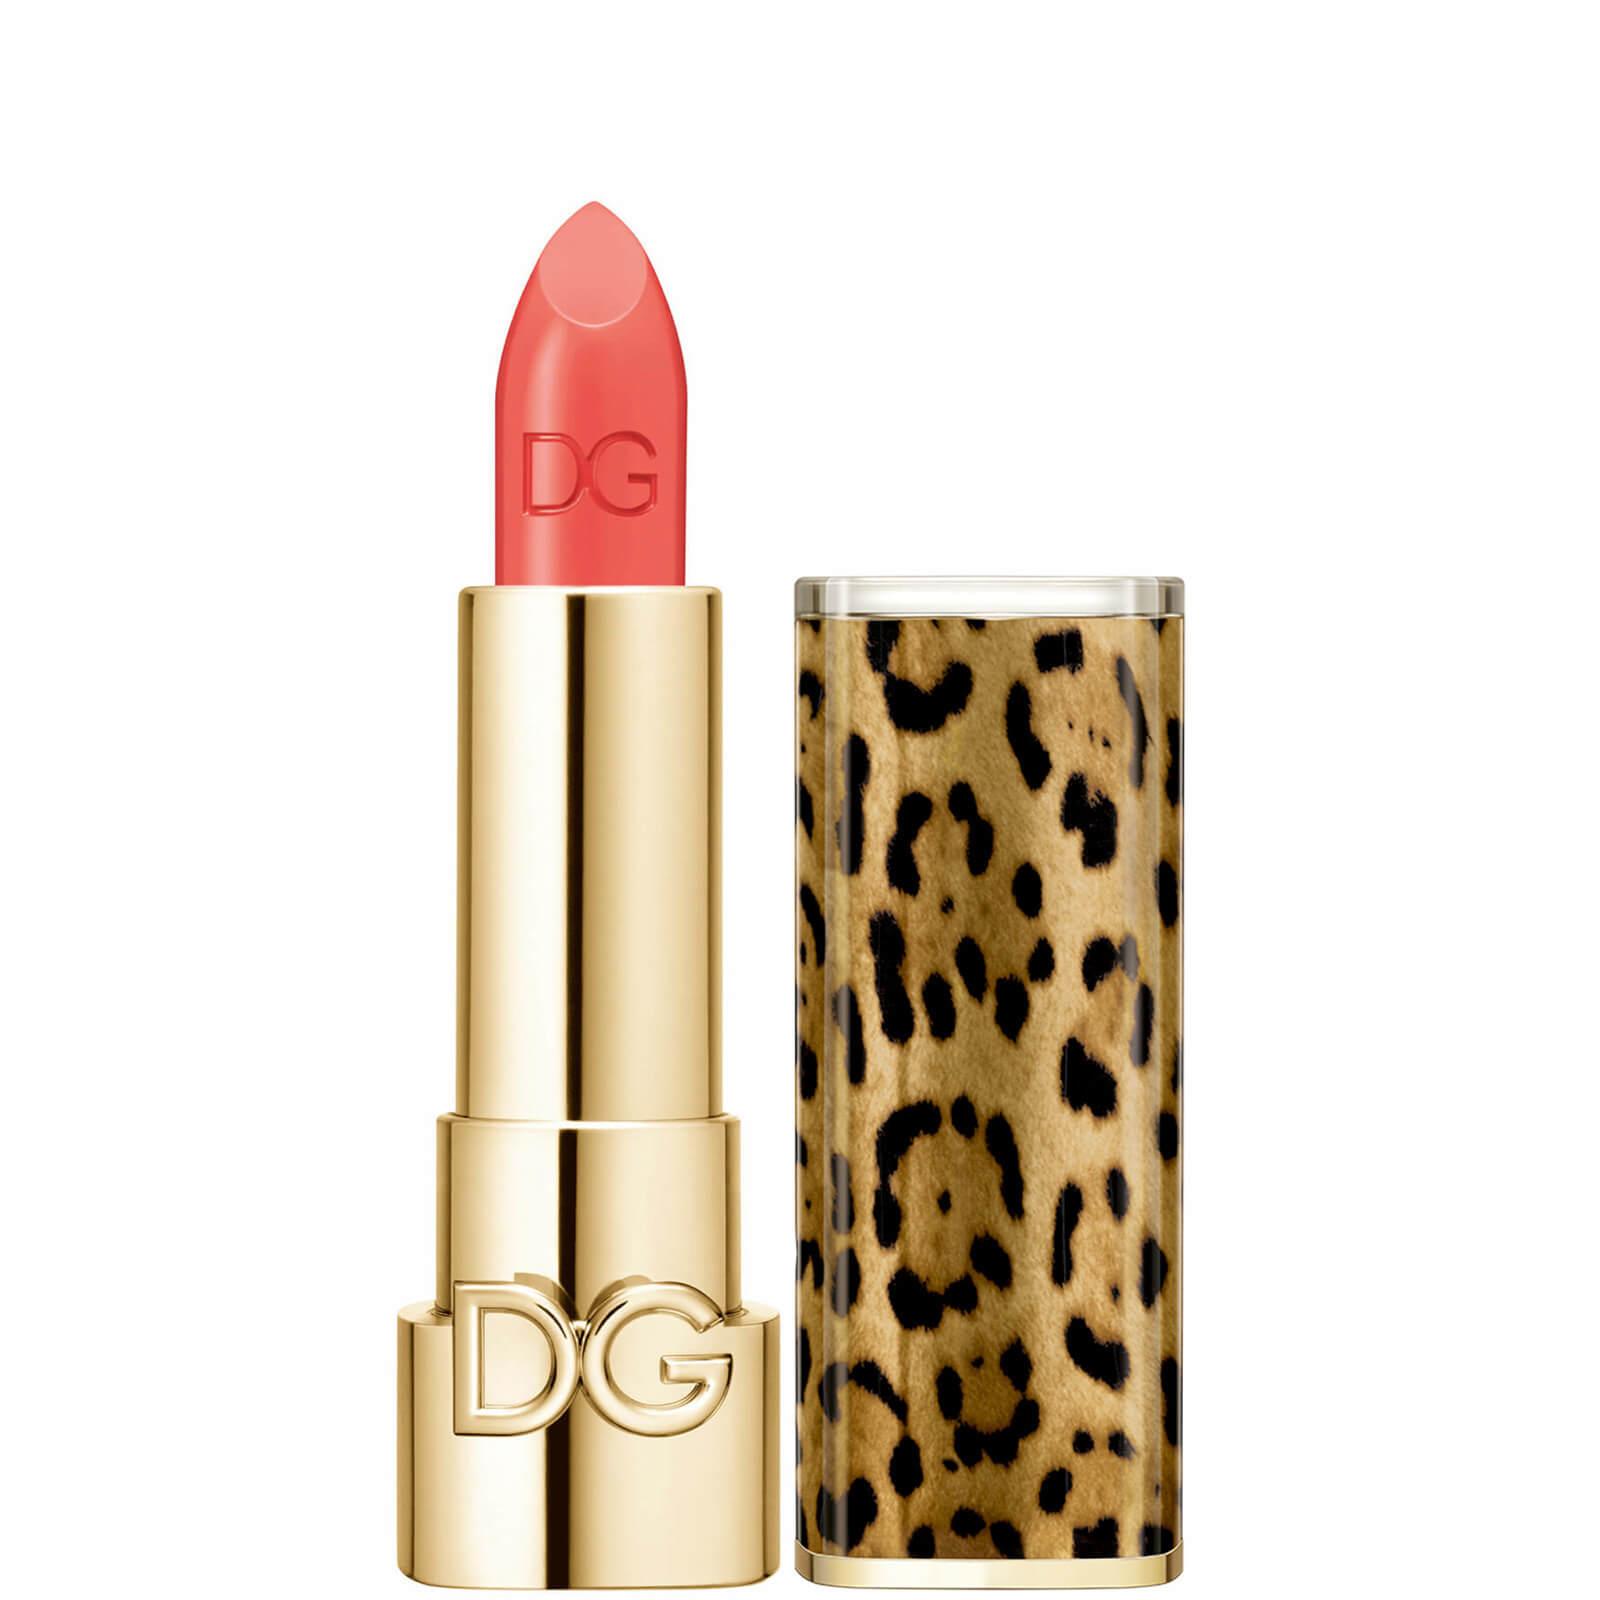 Dolce&Gabbana The Only One Lipstick + Cap (Animalier) (Various Shades) - 500 Joyful Peach